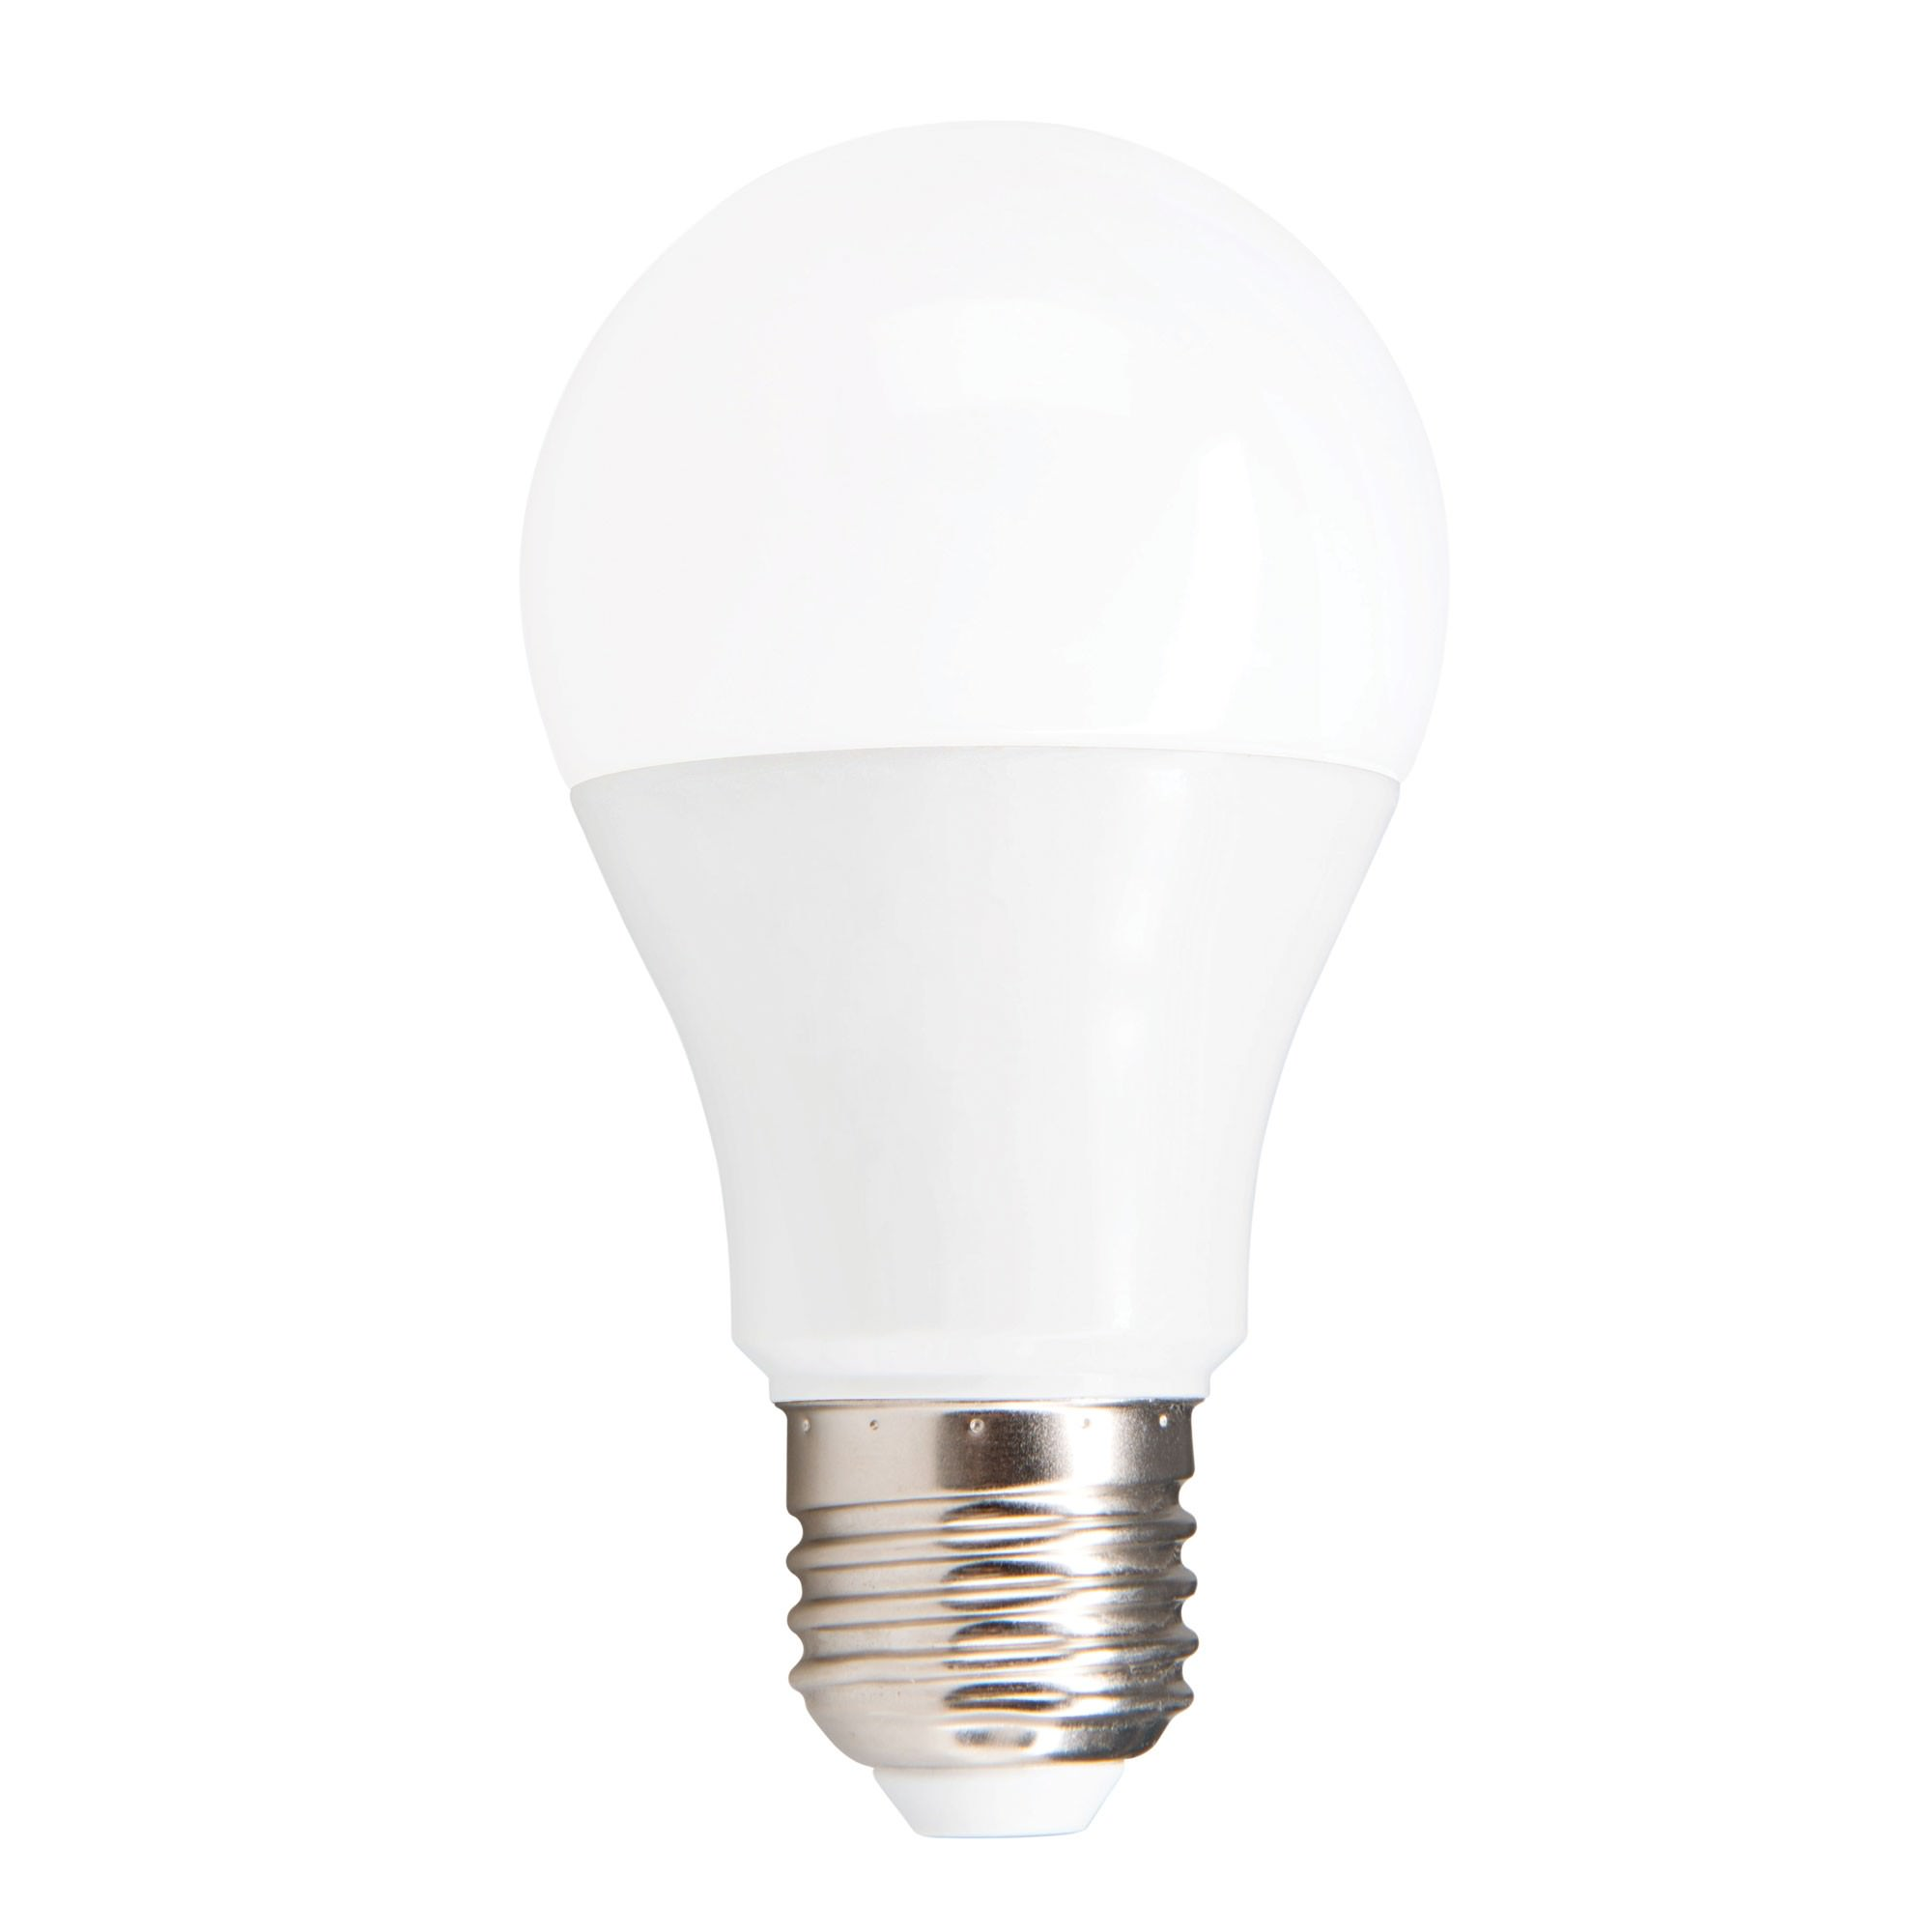 Allume LED Globe, 7W, E27, 4000K, GLS Shape